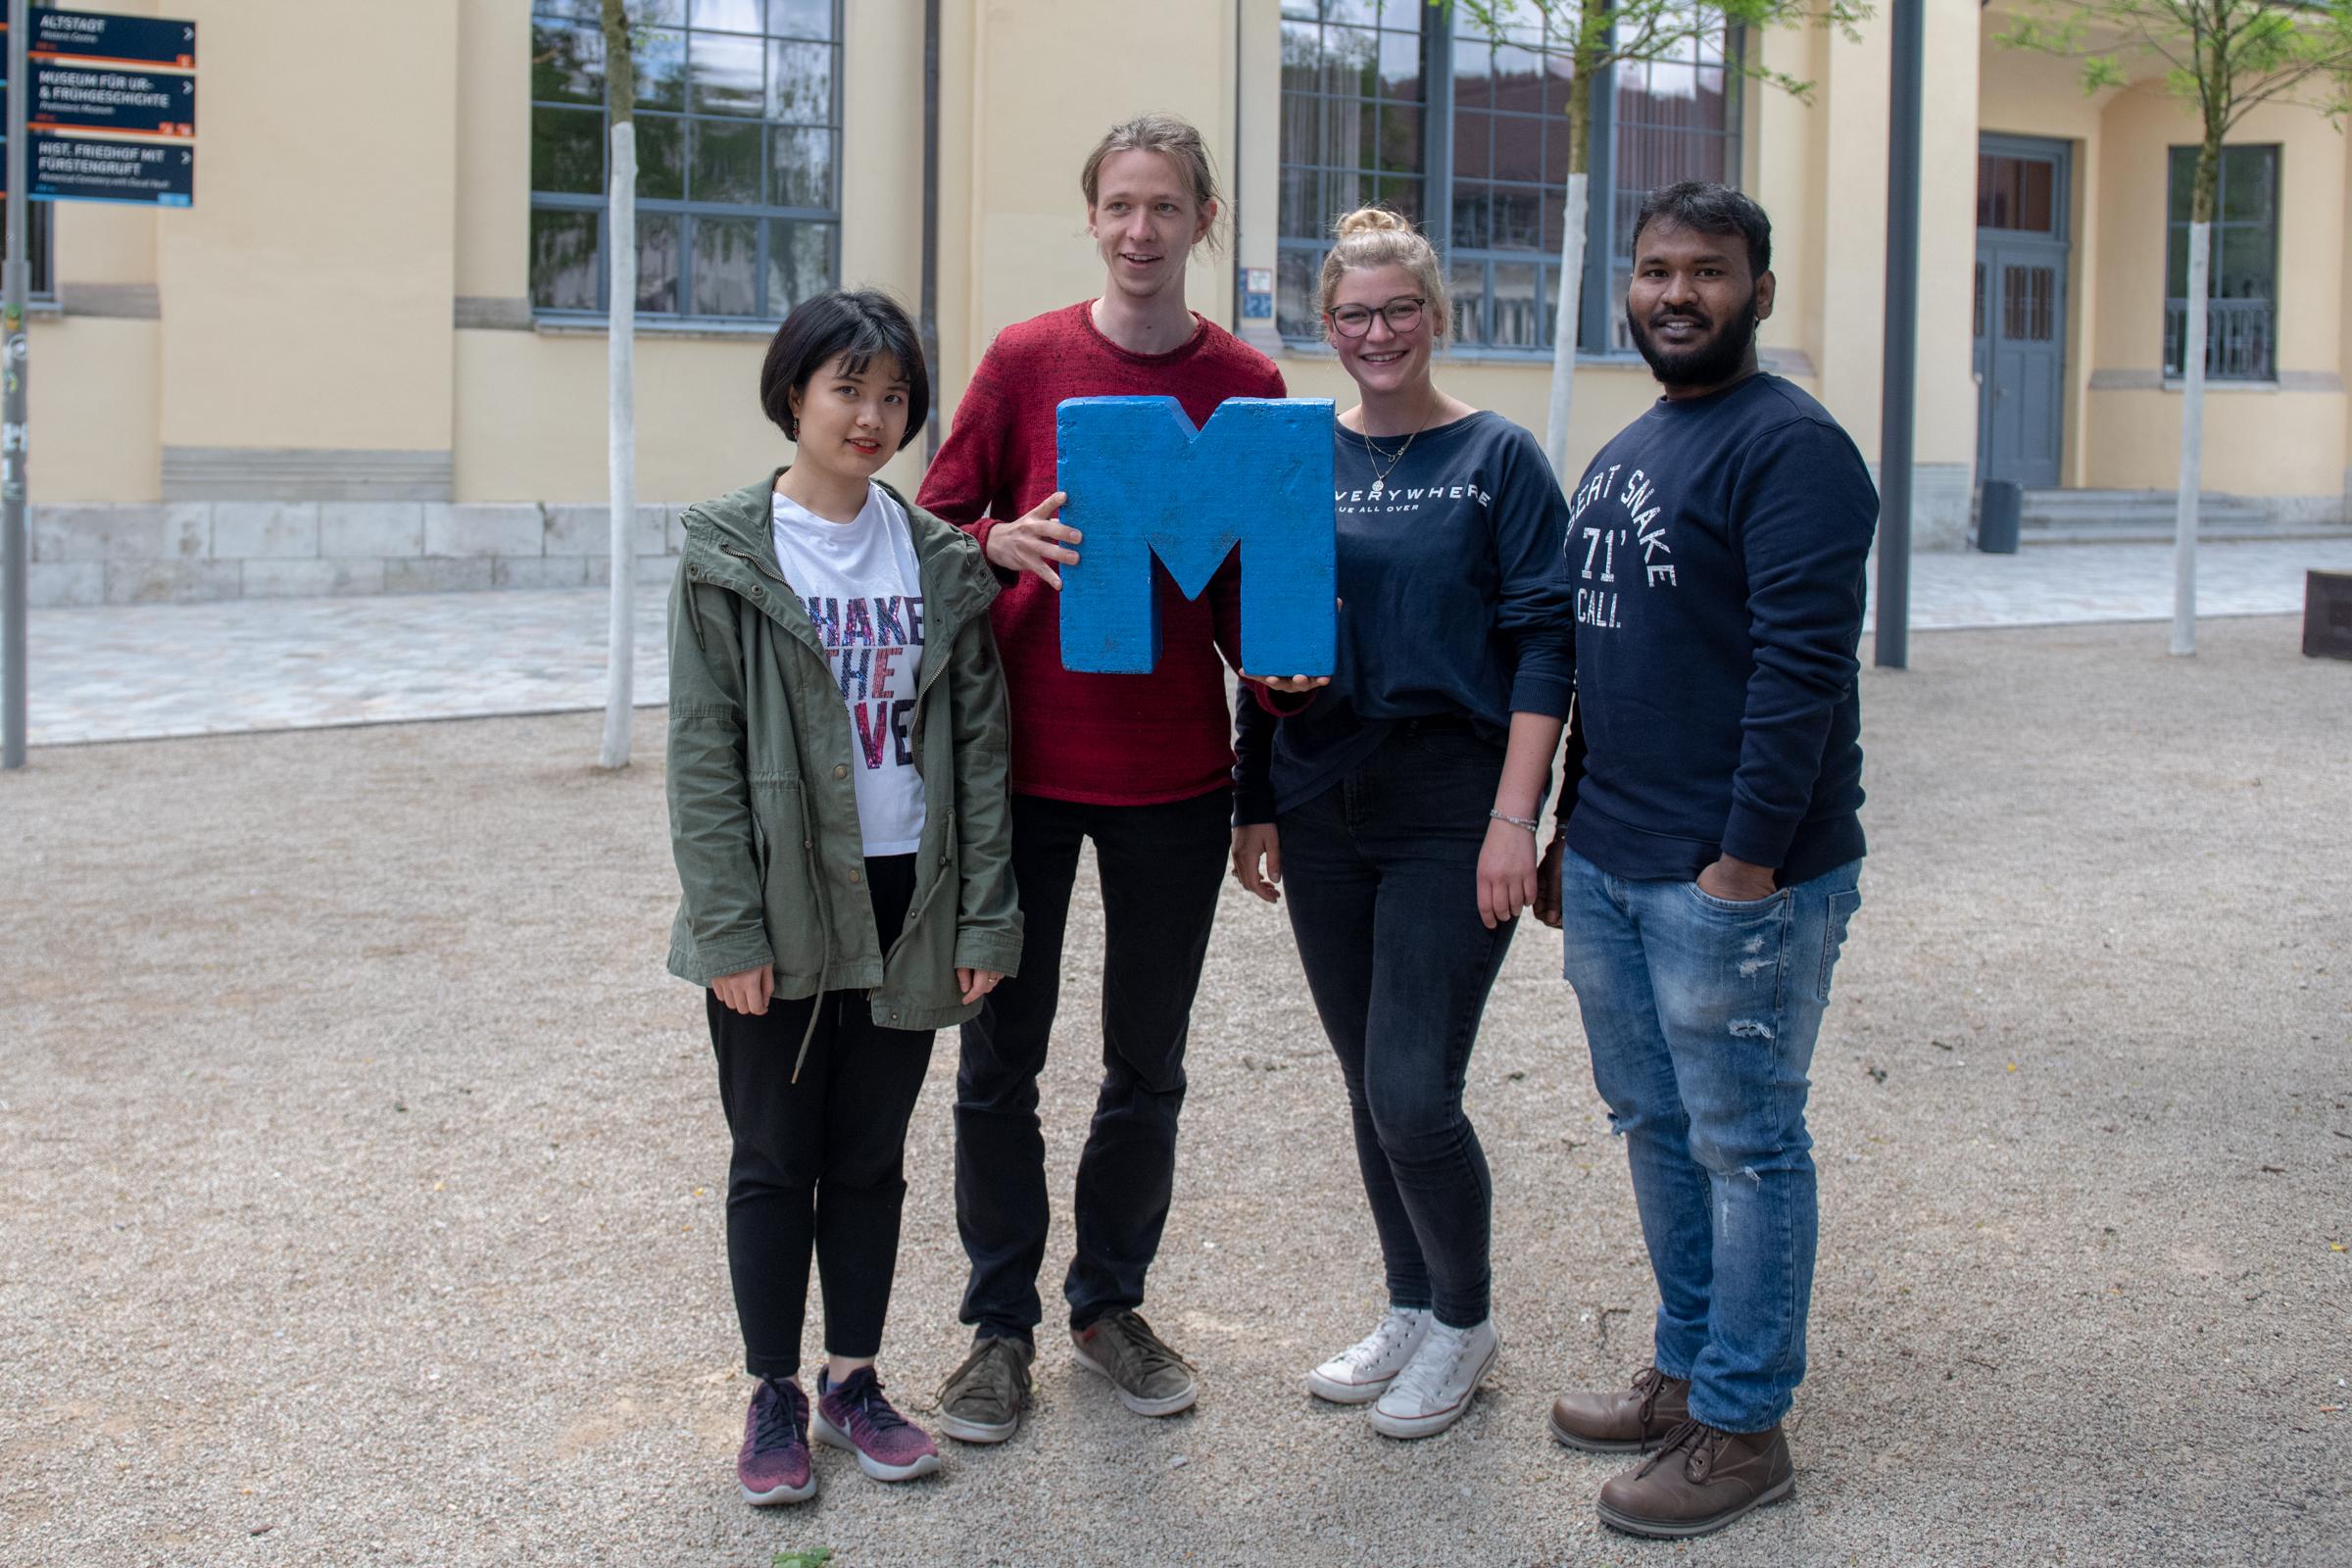 Annie, Knuth, Olli & Aravind